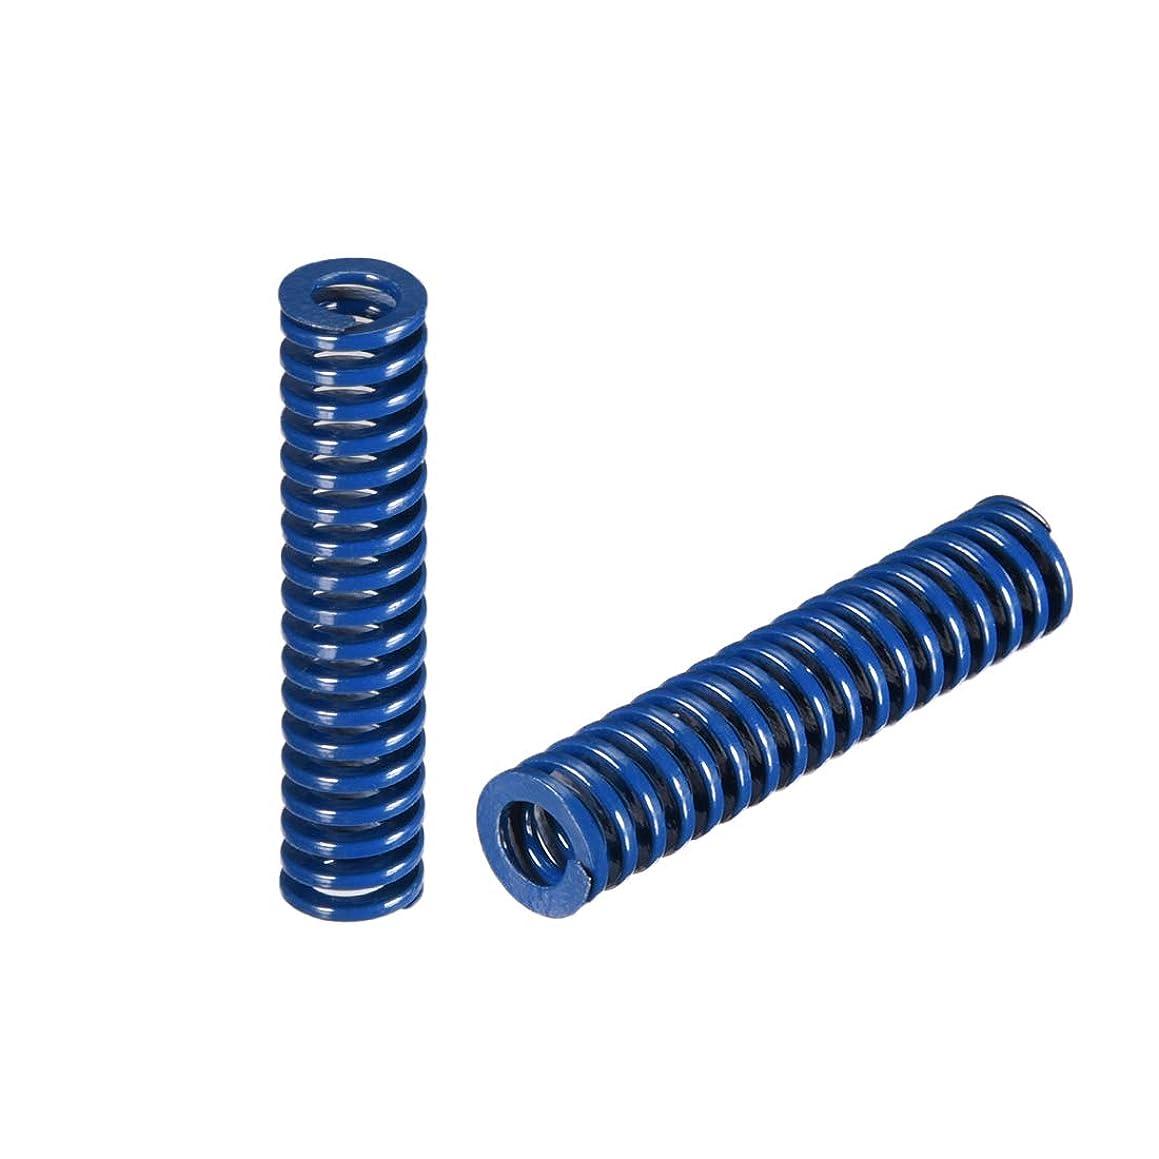 uxcell 8mm OD 35mm Long Spiral Stamping Light Load Compression Mould Die Spring Blue 2Pcs